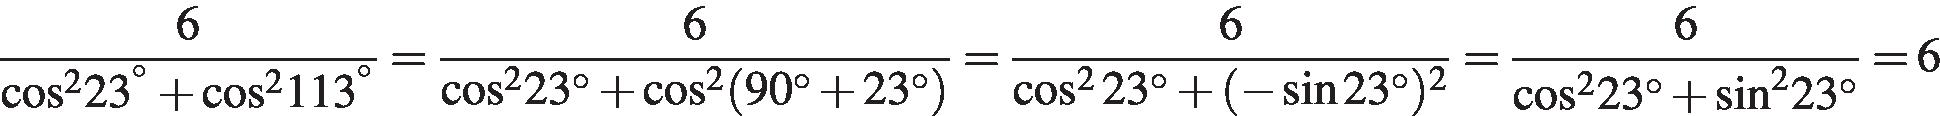 http://reshuege.ru/formula/2c/2c6f310dcda8da8e74de47aec82728ecp.png